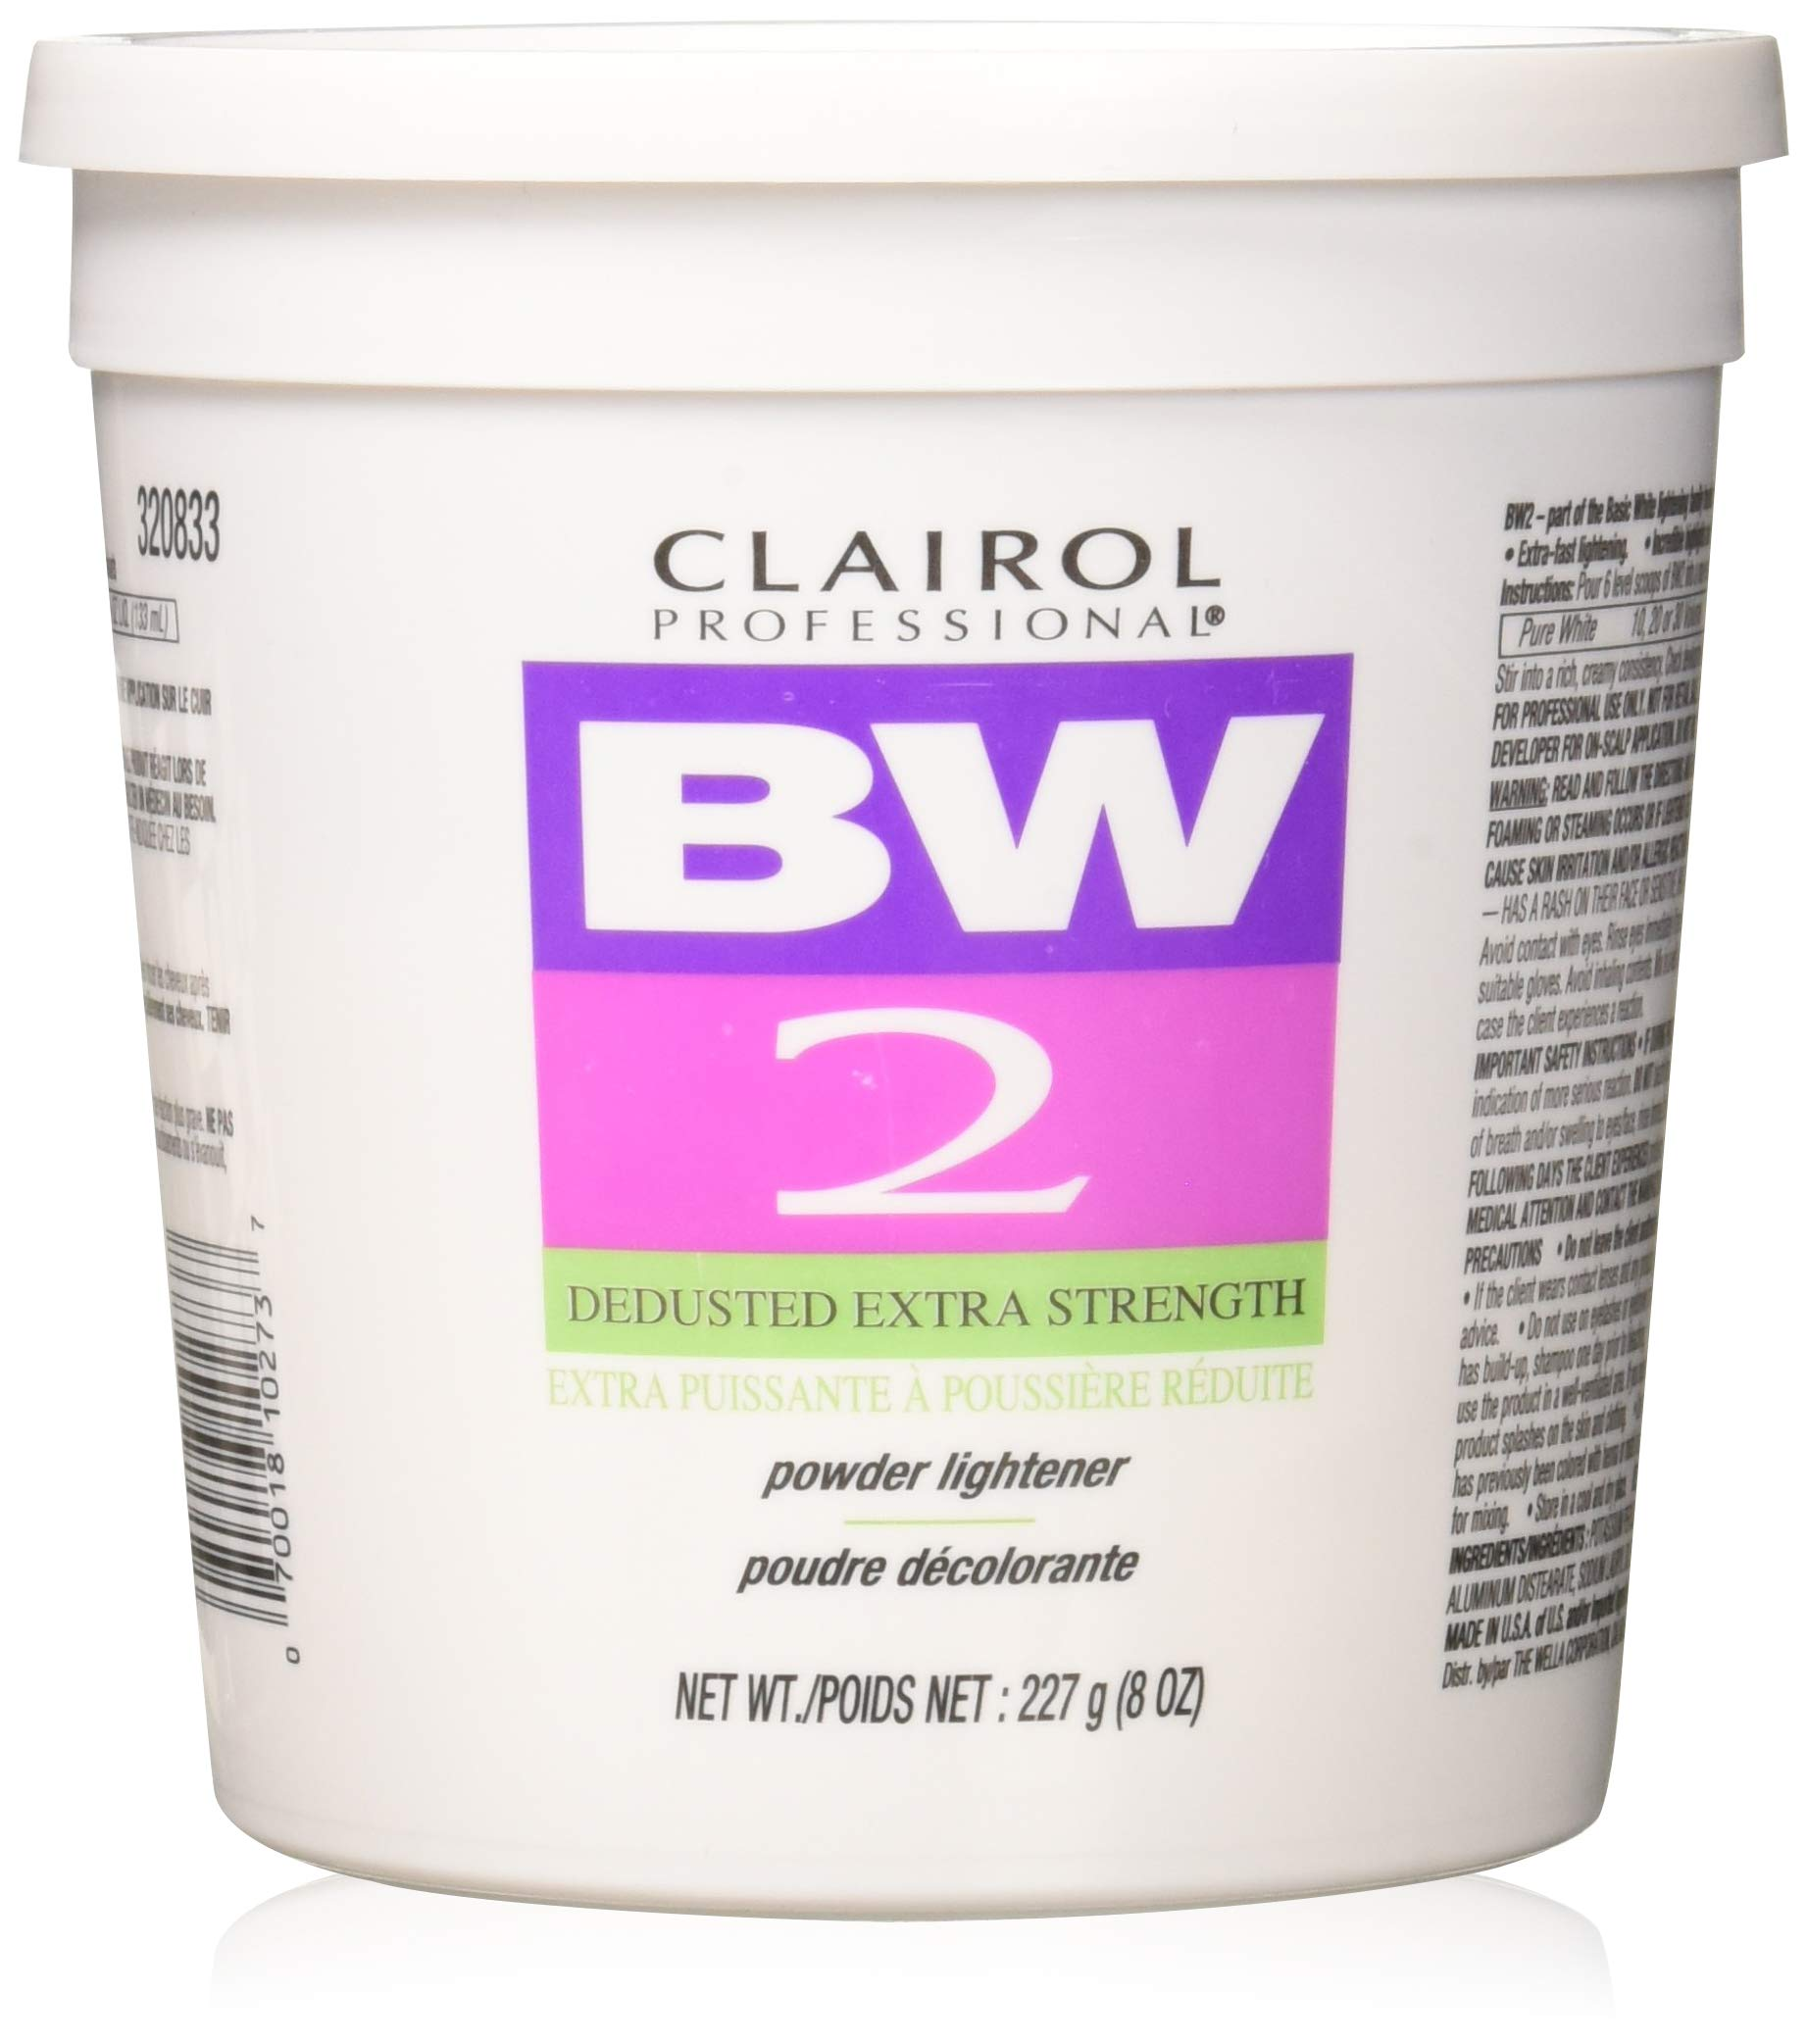 Clairol Bw2 Powder Lightener 2 LB by Clairol